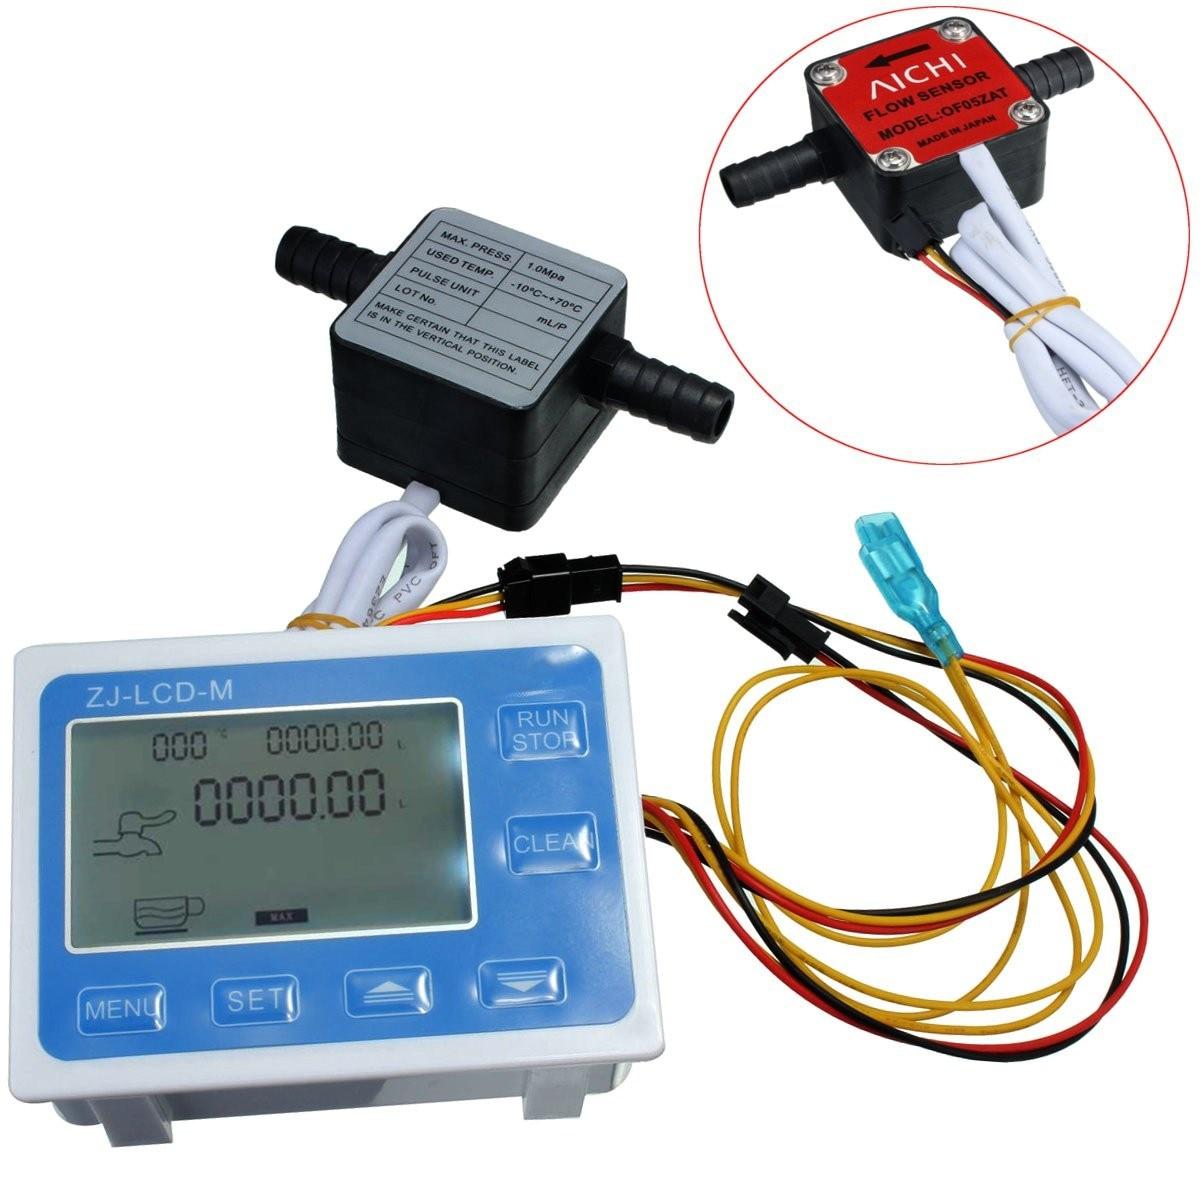 New High Quality Liquid Gear Flow Water Sensor Meter + LCD Digital Meter Quantitative Control Set